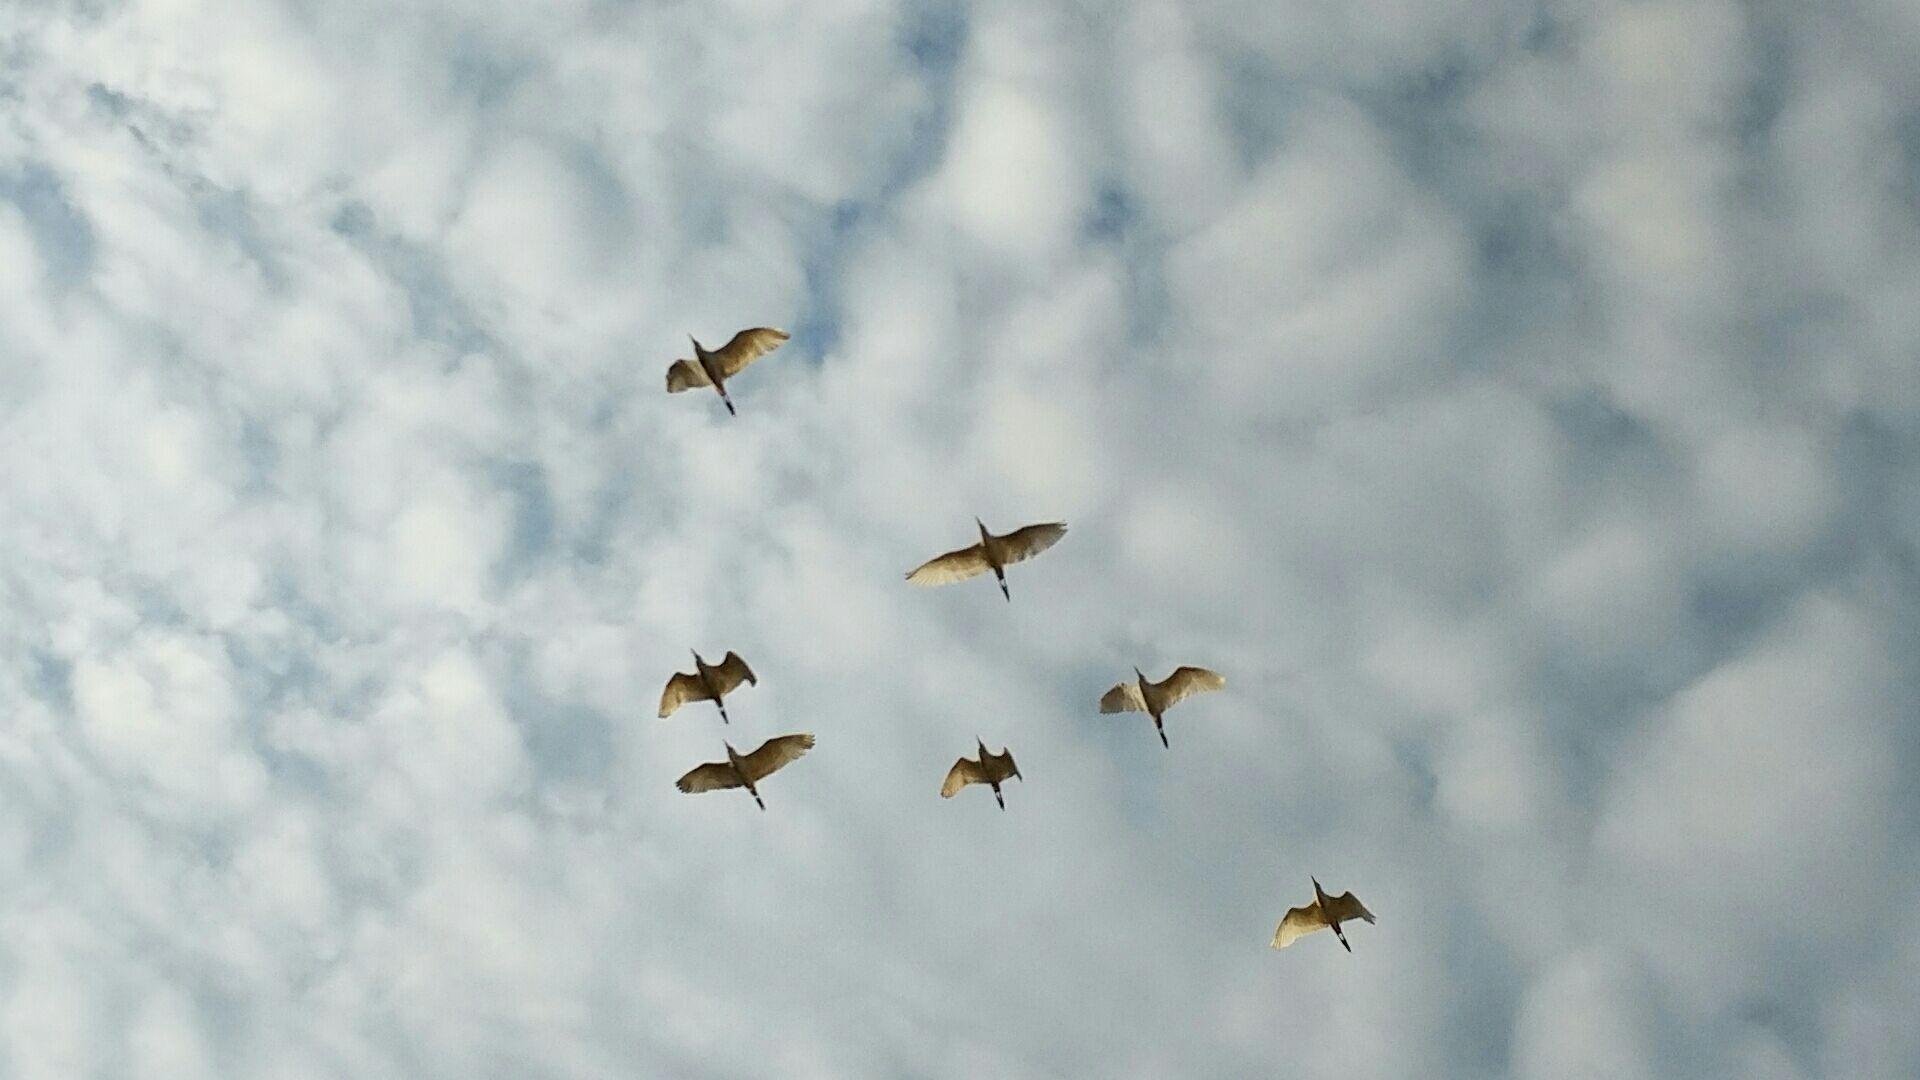 3dmax鸟天空贴图素材